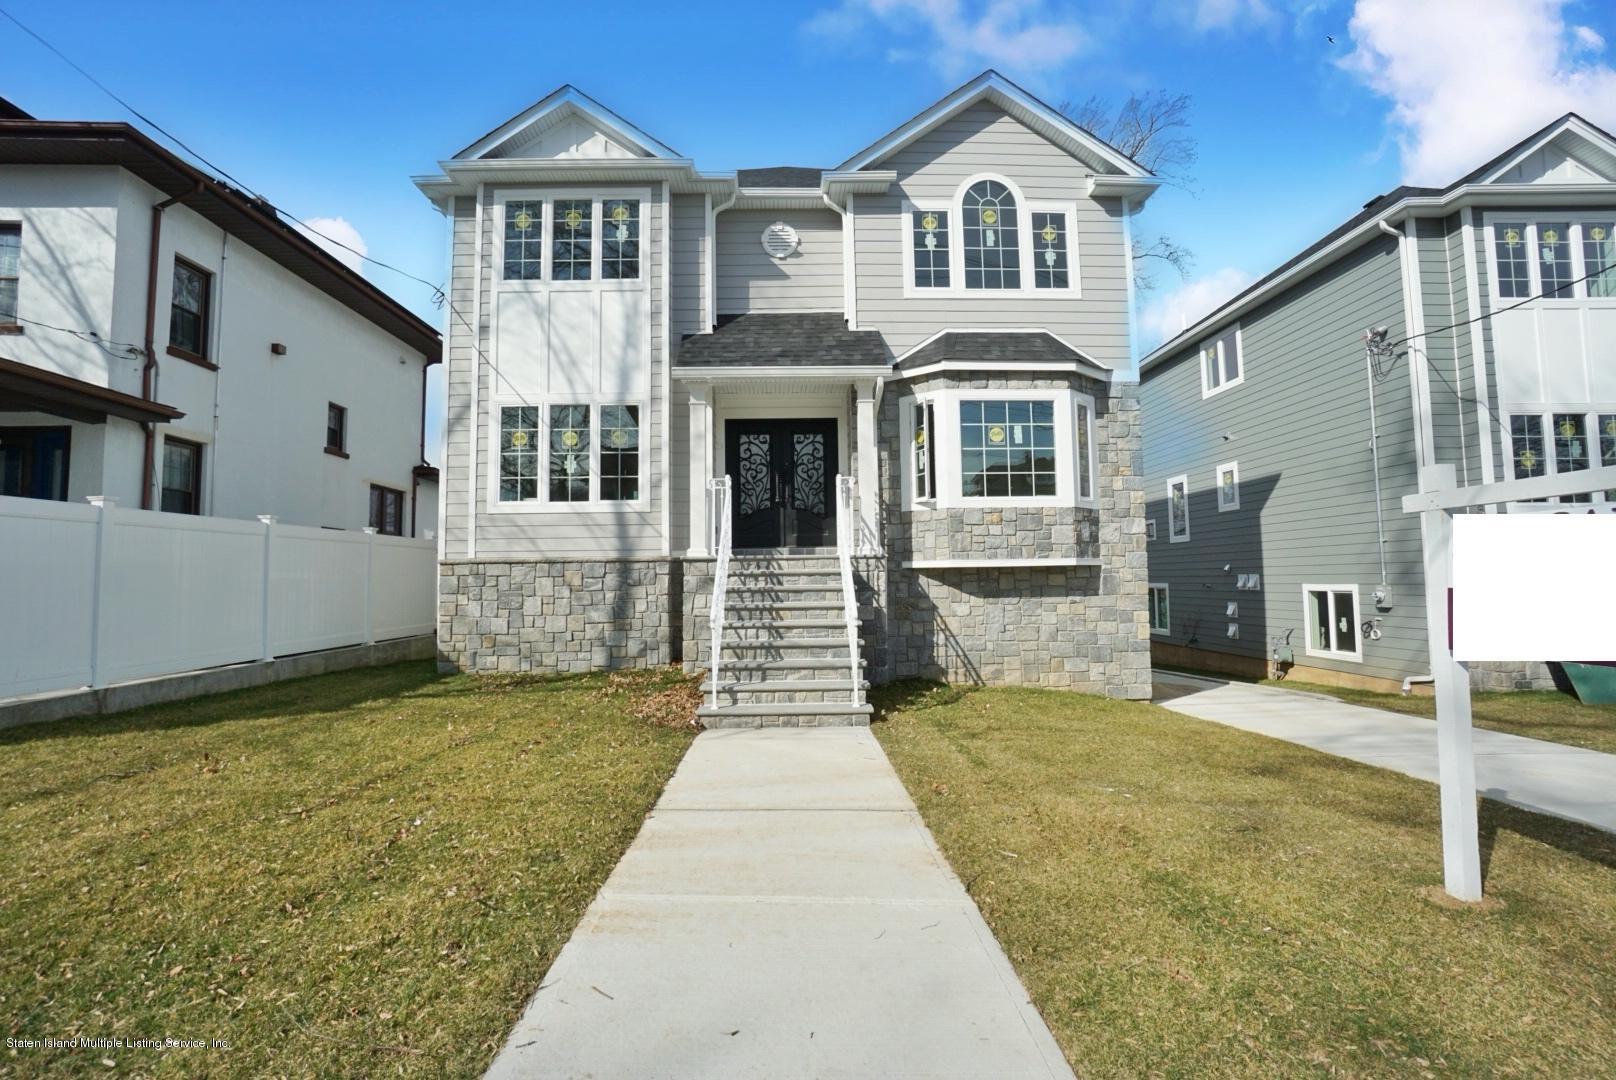 Single Family - Detached 170 Fairview Avenue  Staten Island, NY 10314, MLS-1126684-3